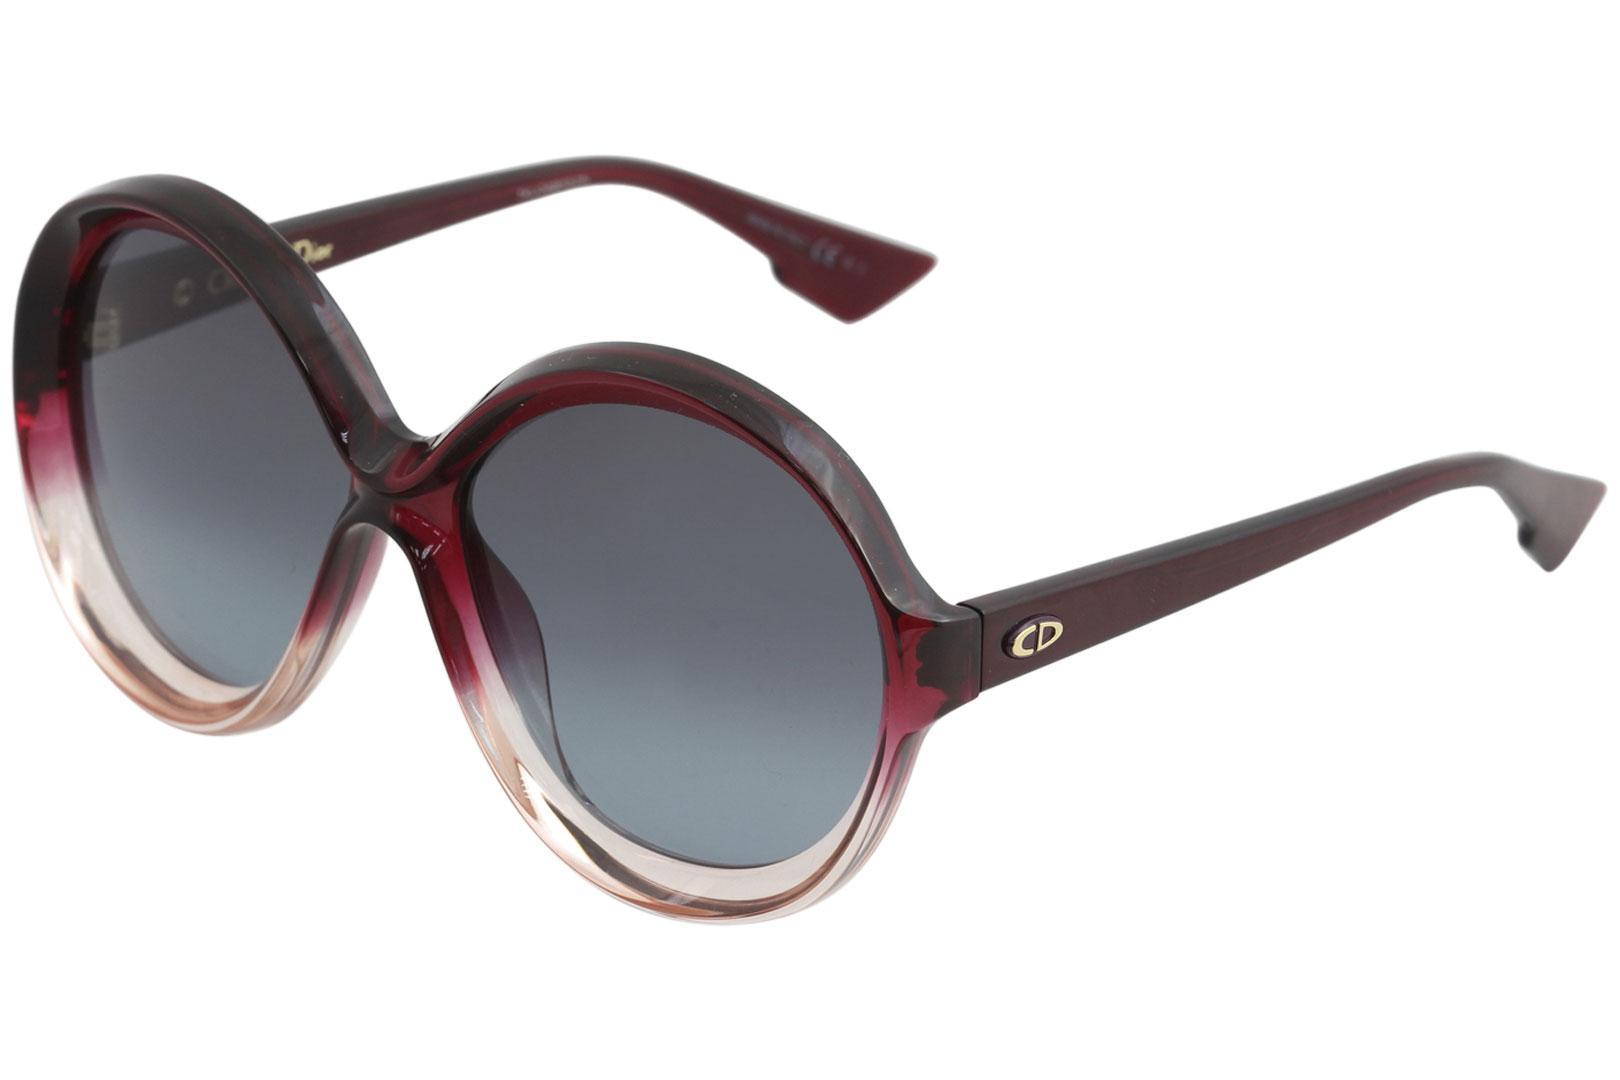 Image of Christian Dior Women's DiorBianca Fashion Round Sunglasses - Red - Lens 56 Bridge 15 Temple 145mm